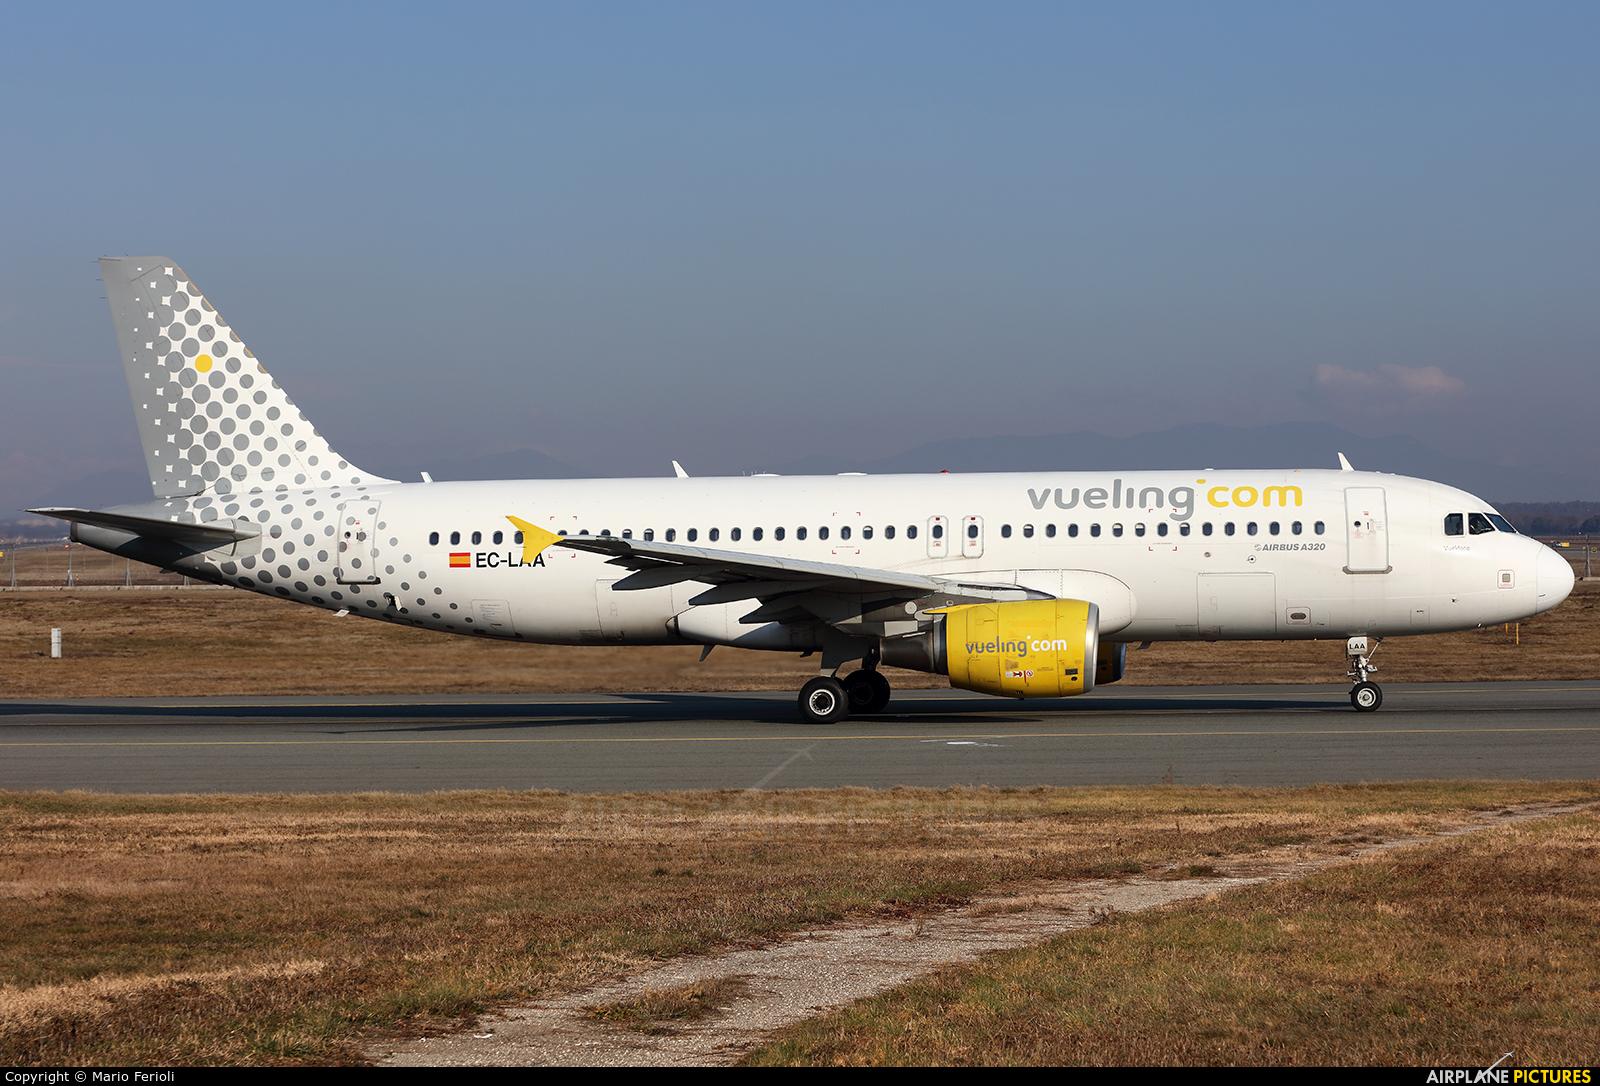 Vueling Airlines EC-LAA aircraft at Milan - Malpensa